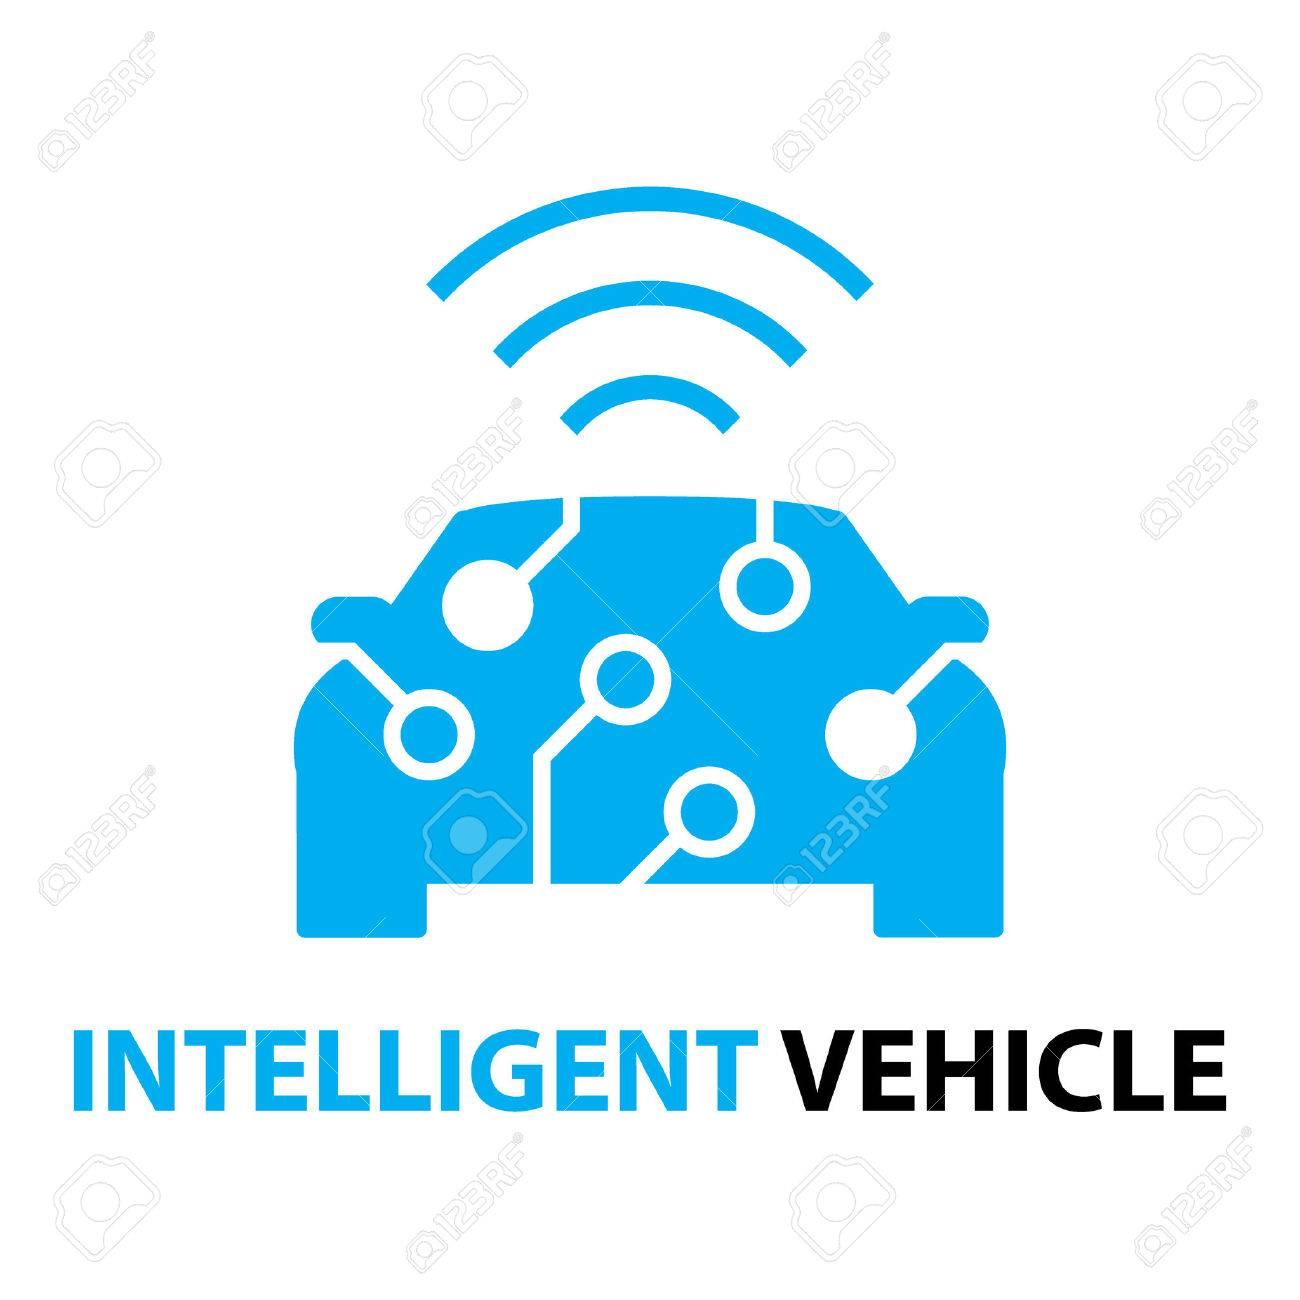 smart car,Intelligent Vehicle icon and symbol - 63399418